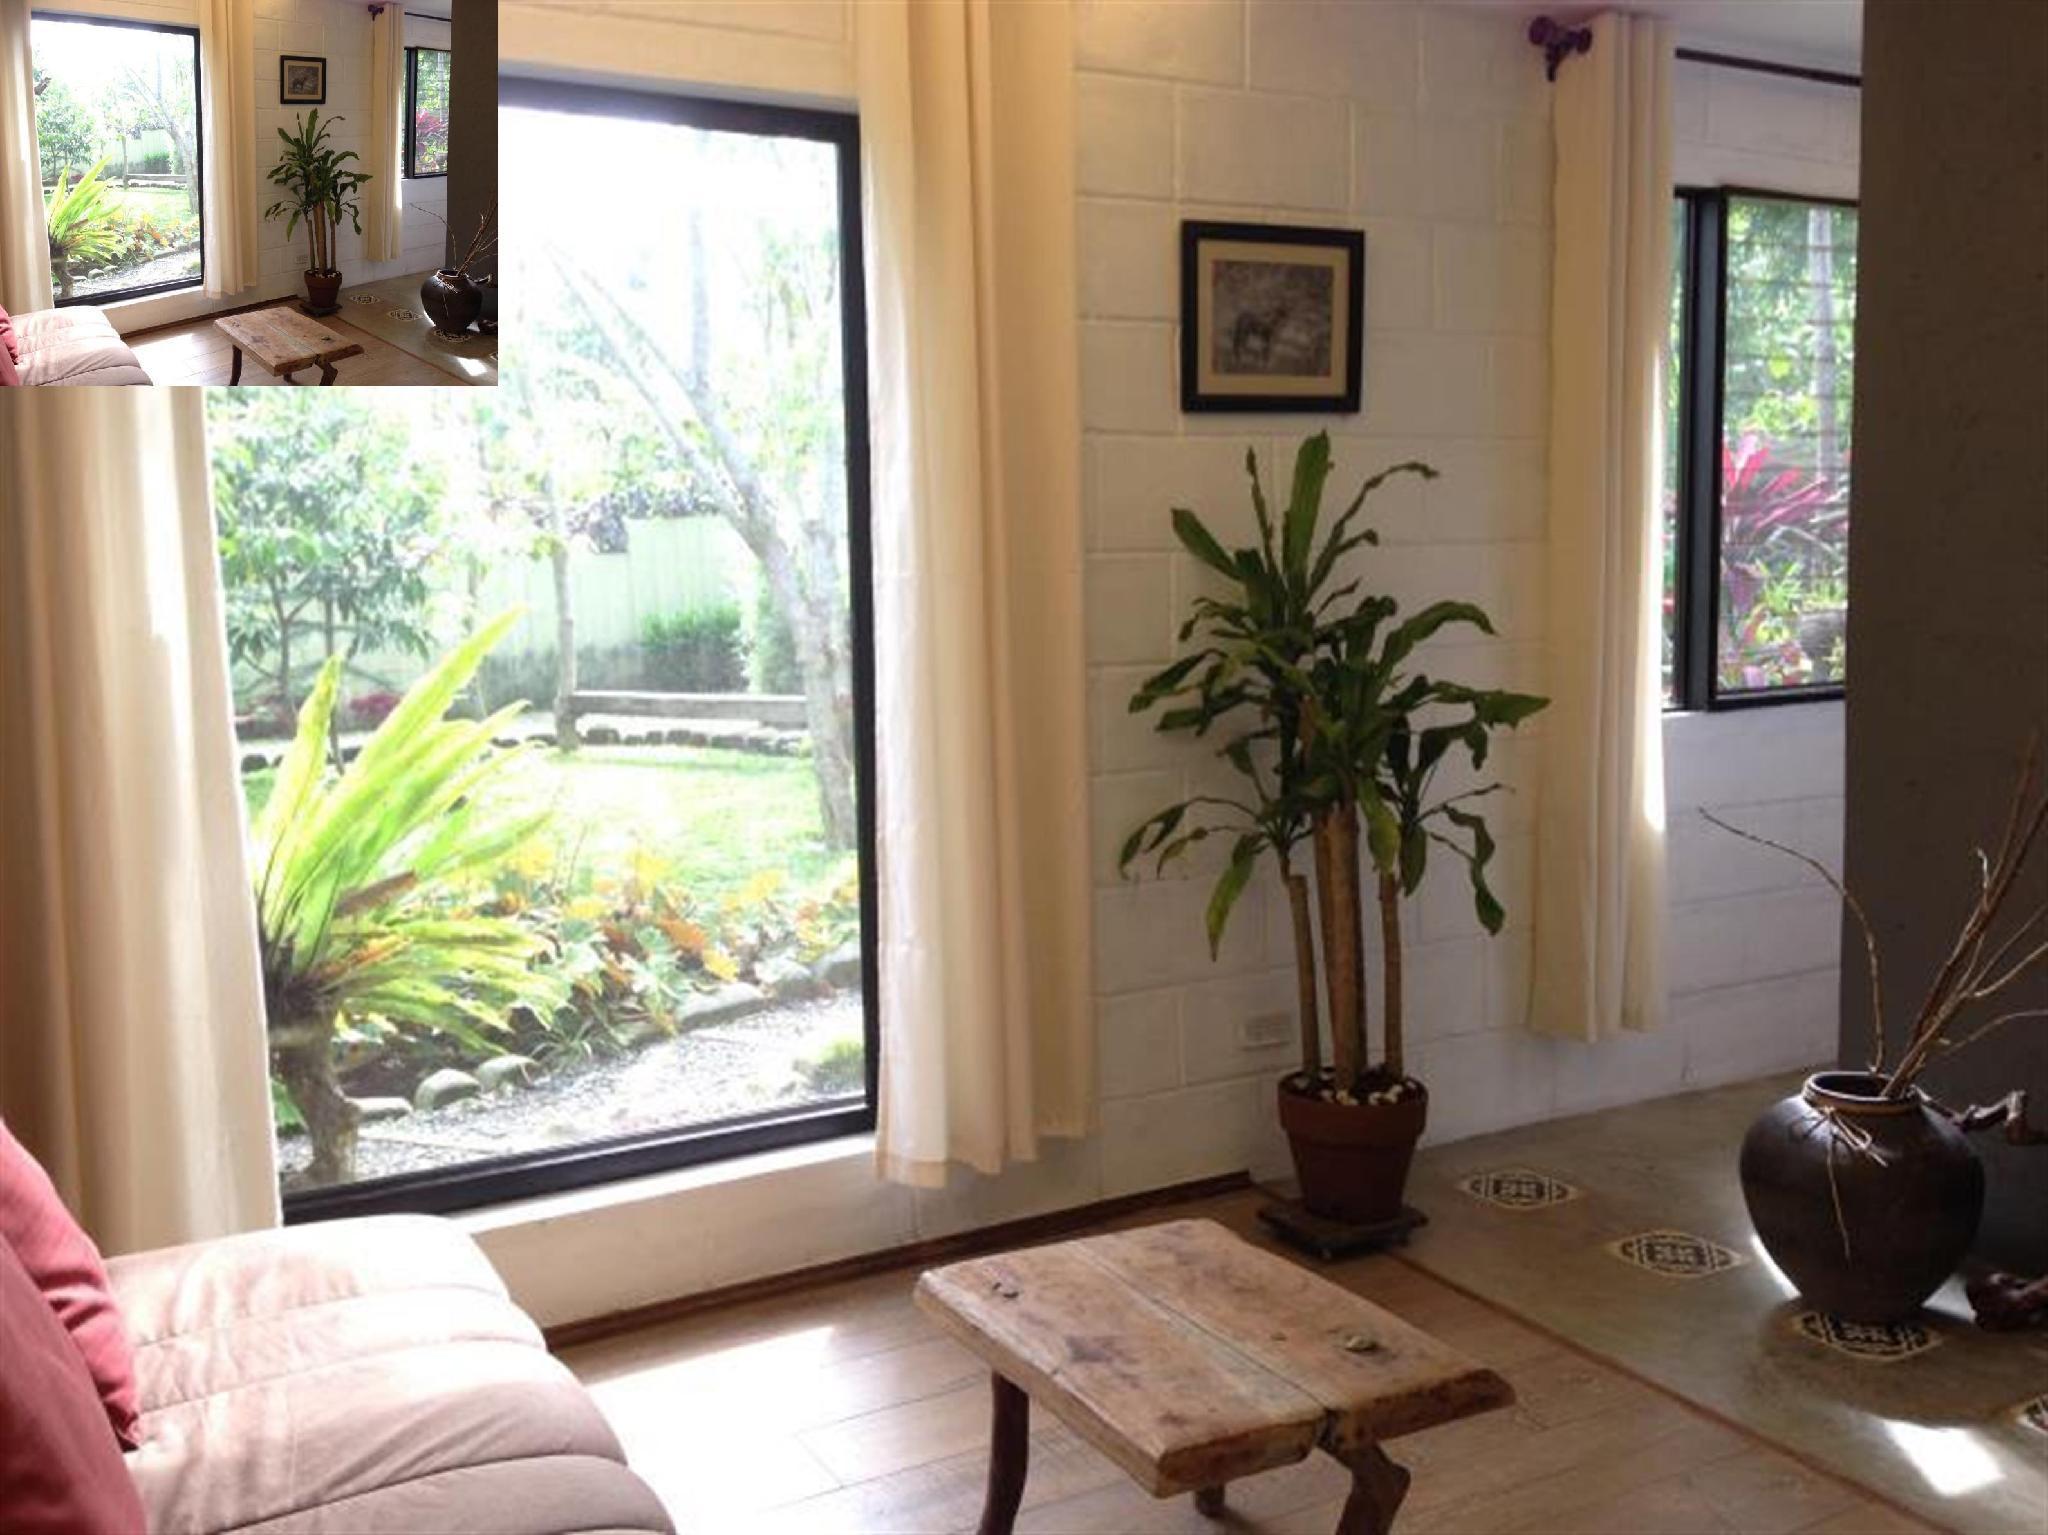 John S Hammock Vacation House In Ta Tay In Philippines